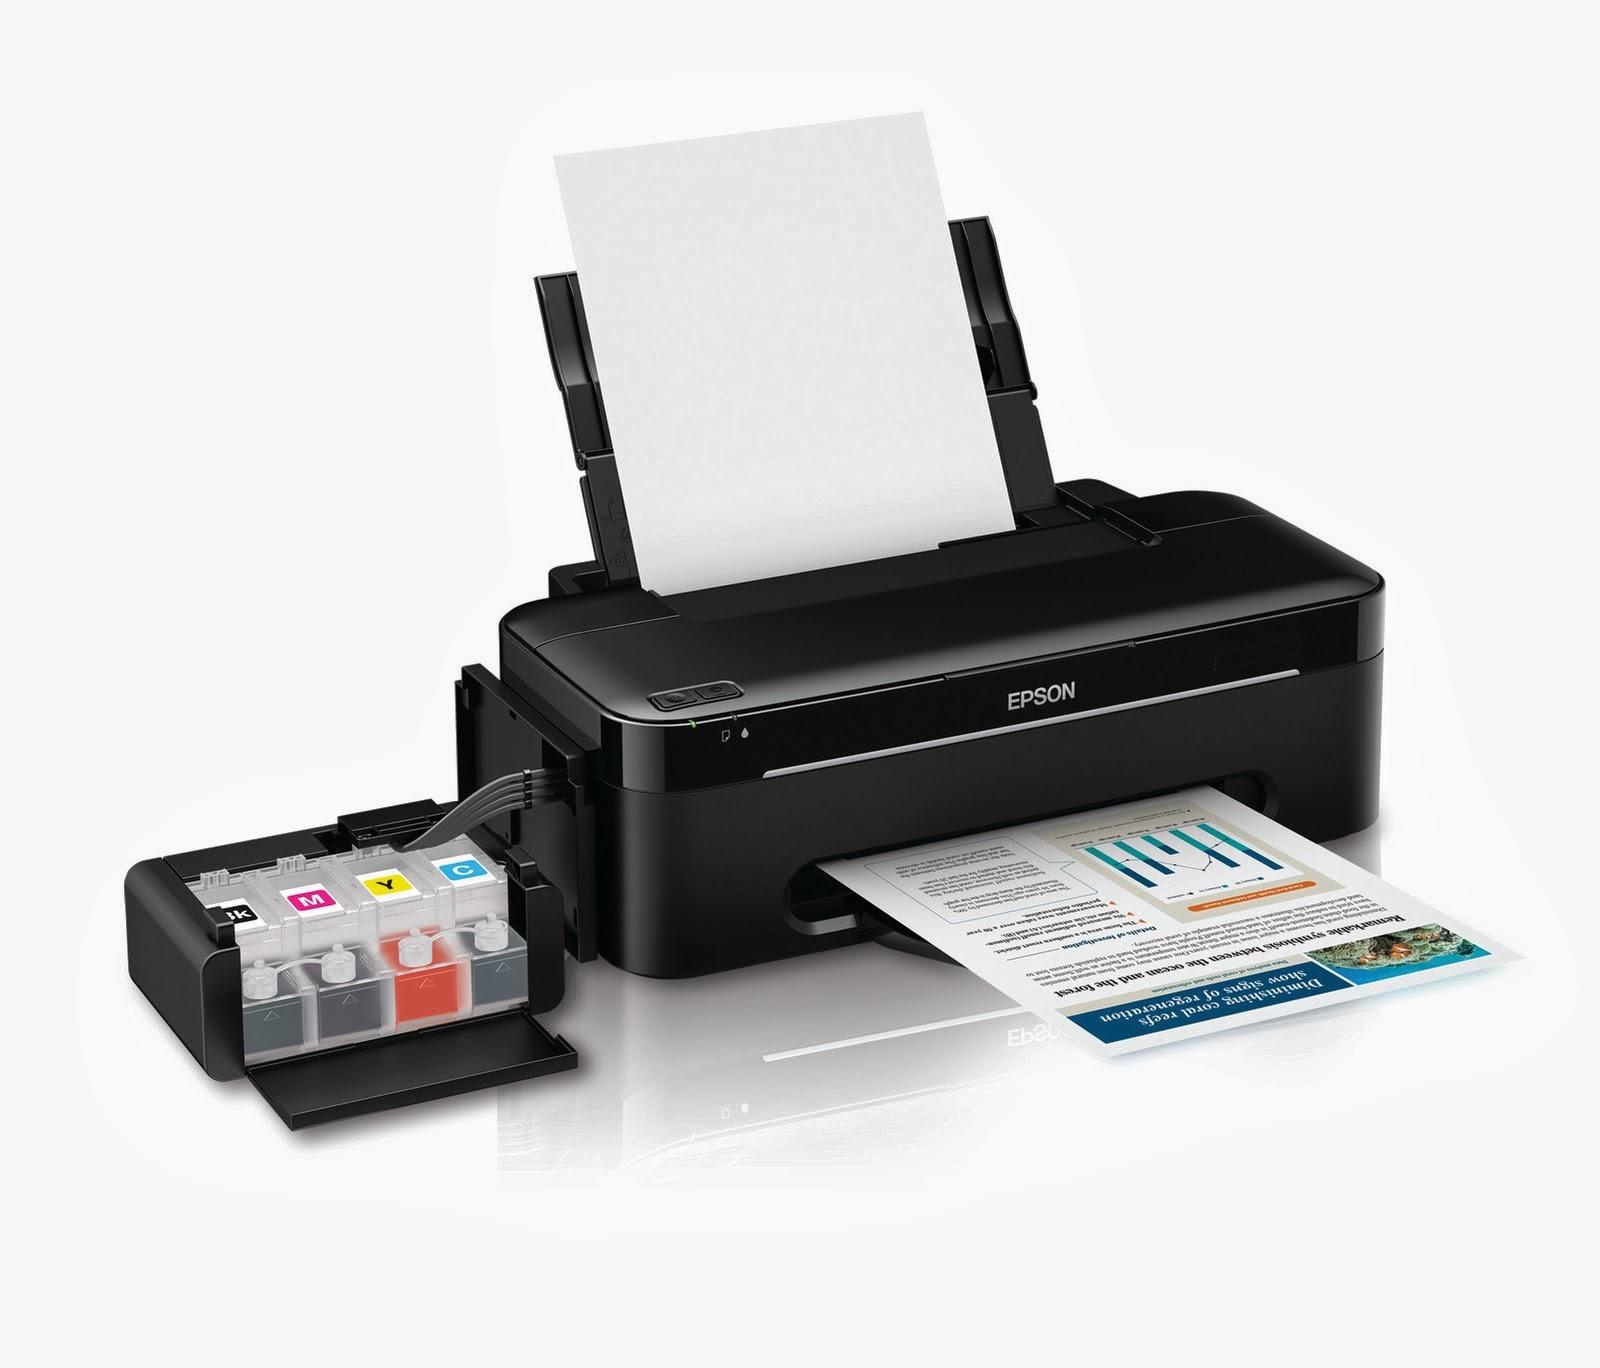 epson l200 reset e portal rh eportalph blogspot com Epson L200 Philippines epson l200 printer user guide